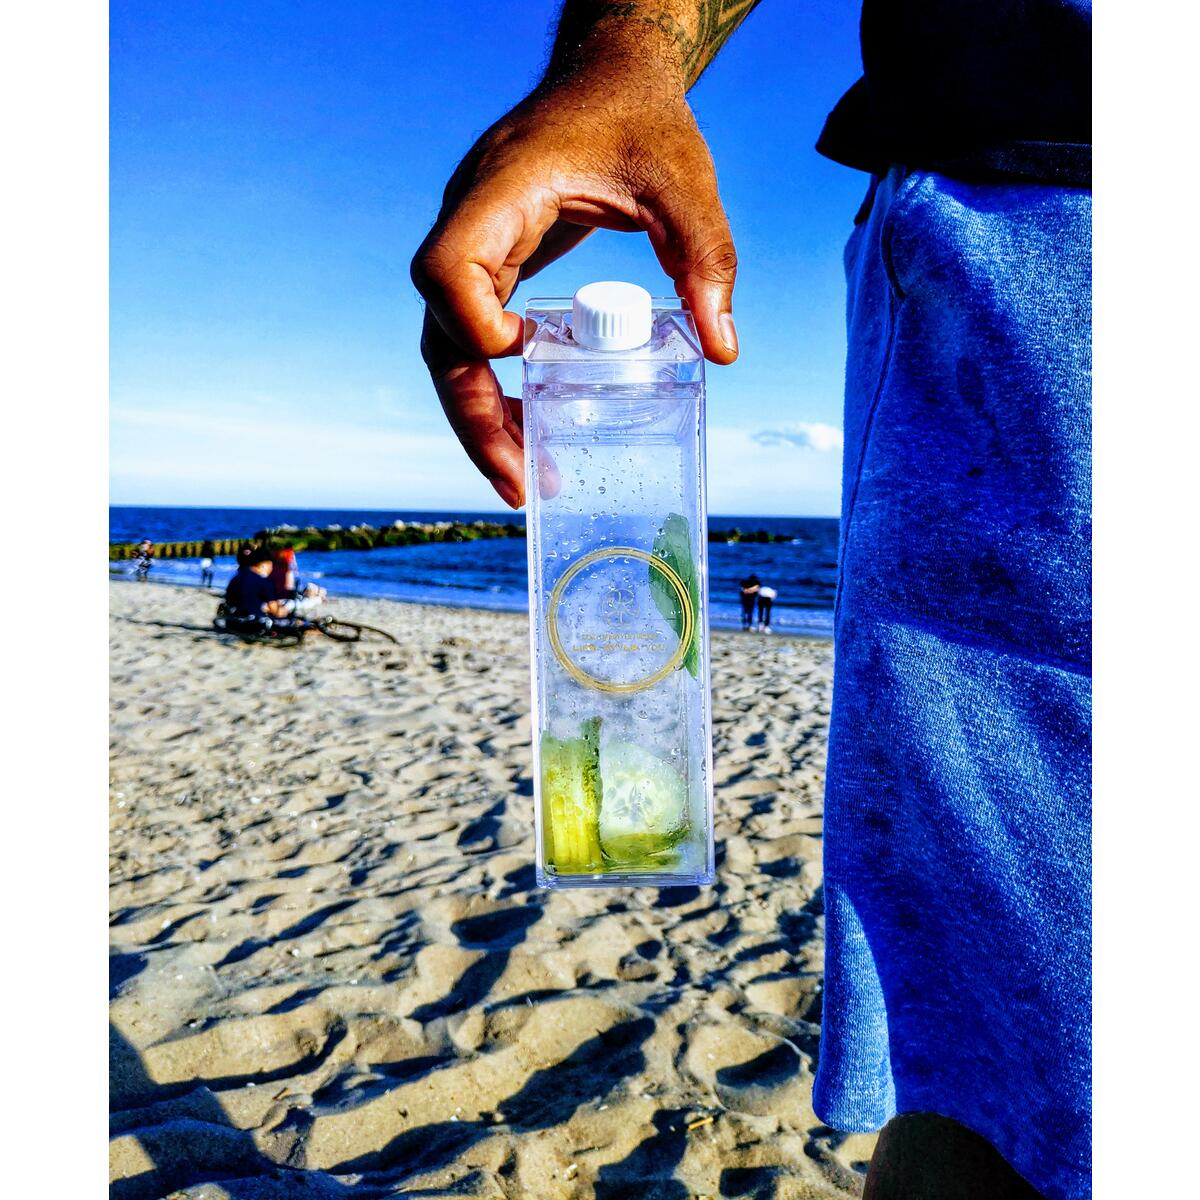 Eco Friendly - Reusable - Water/Beverage Bottle